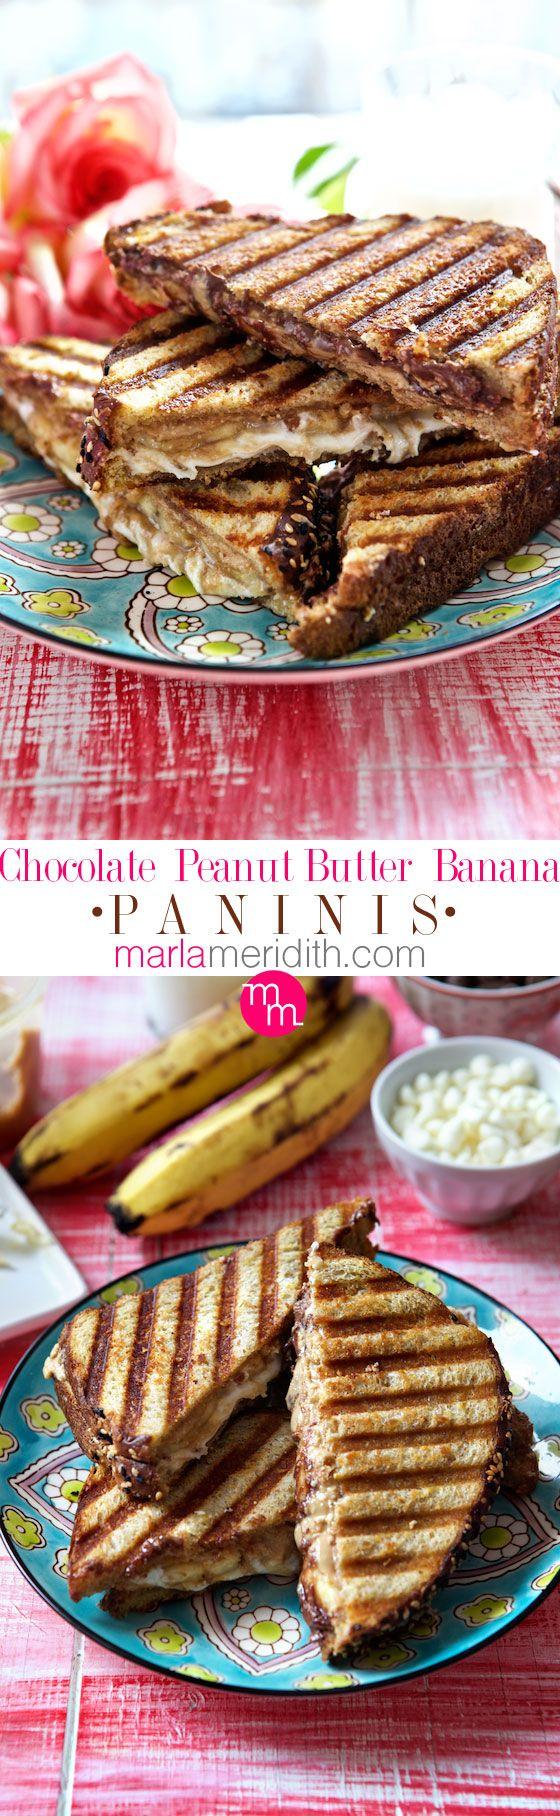 Chocolate Peanut Butter Banana Paninis | #recipe on MarlaMeridith.com ( @marlameridith )